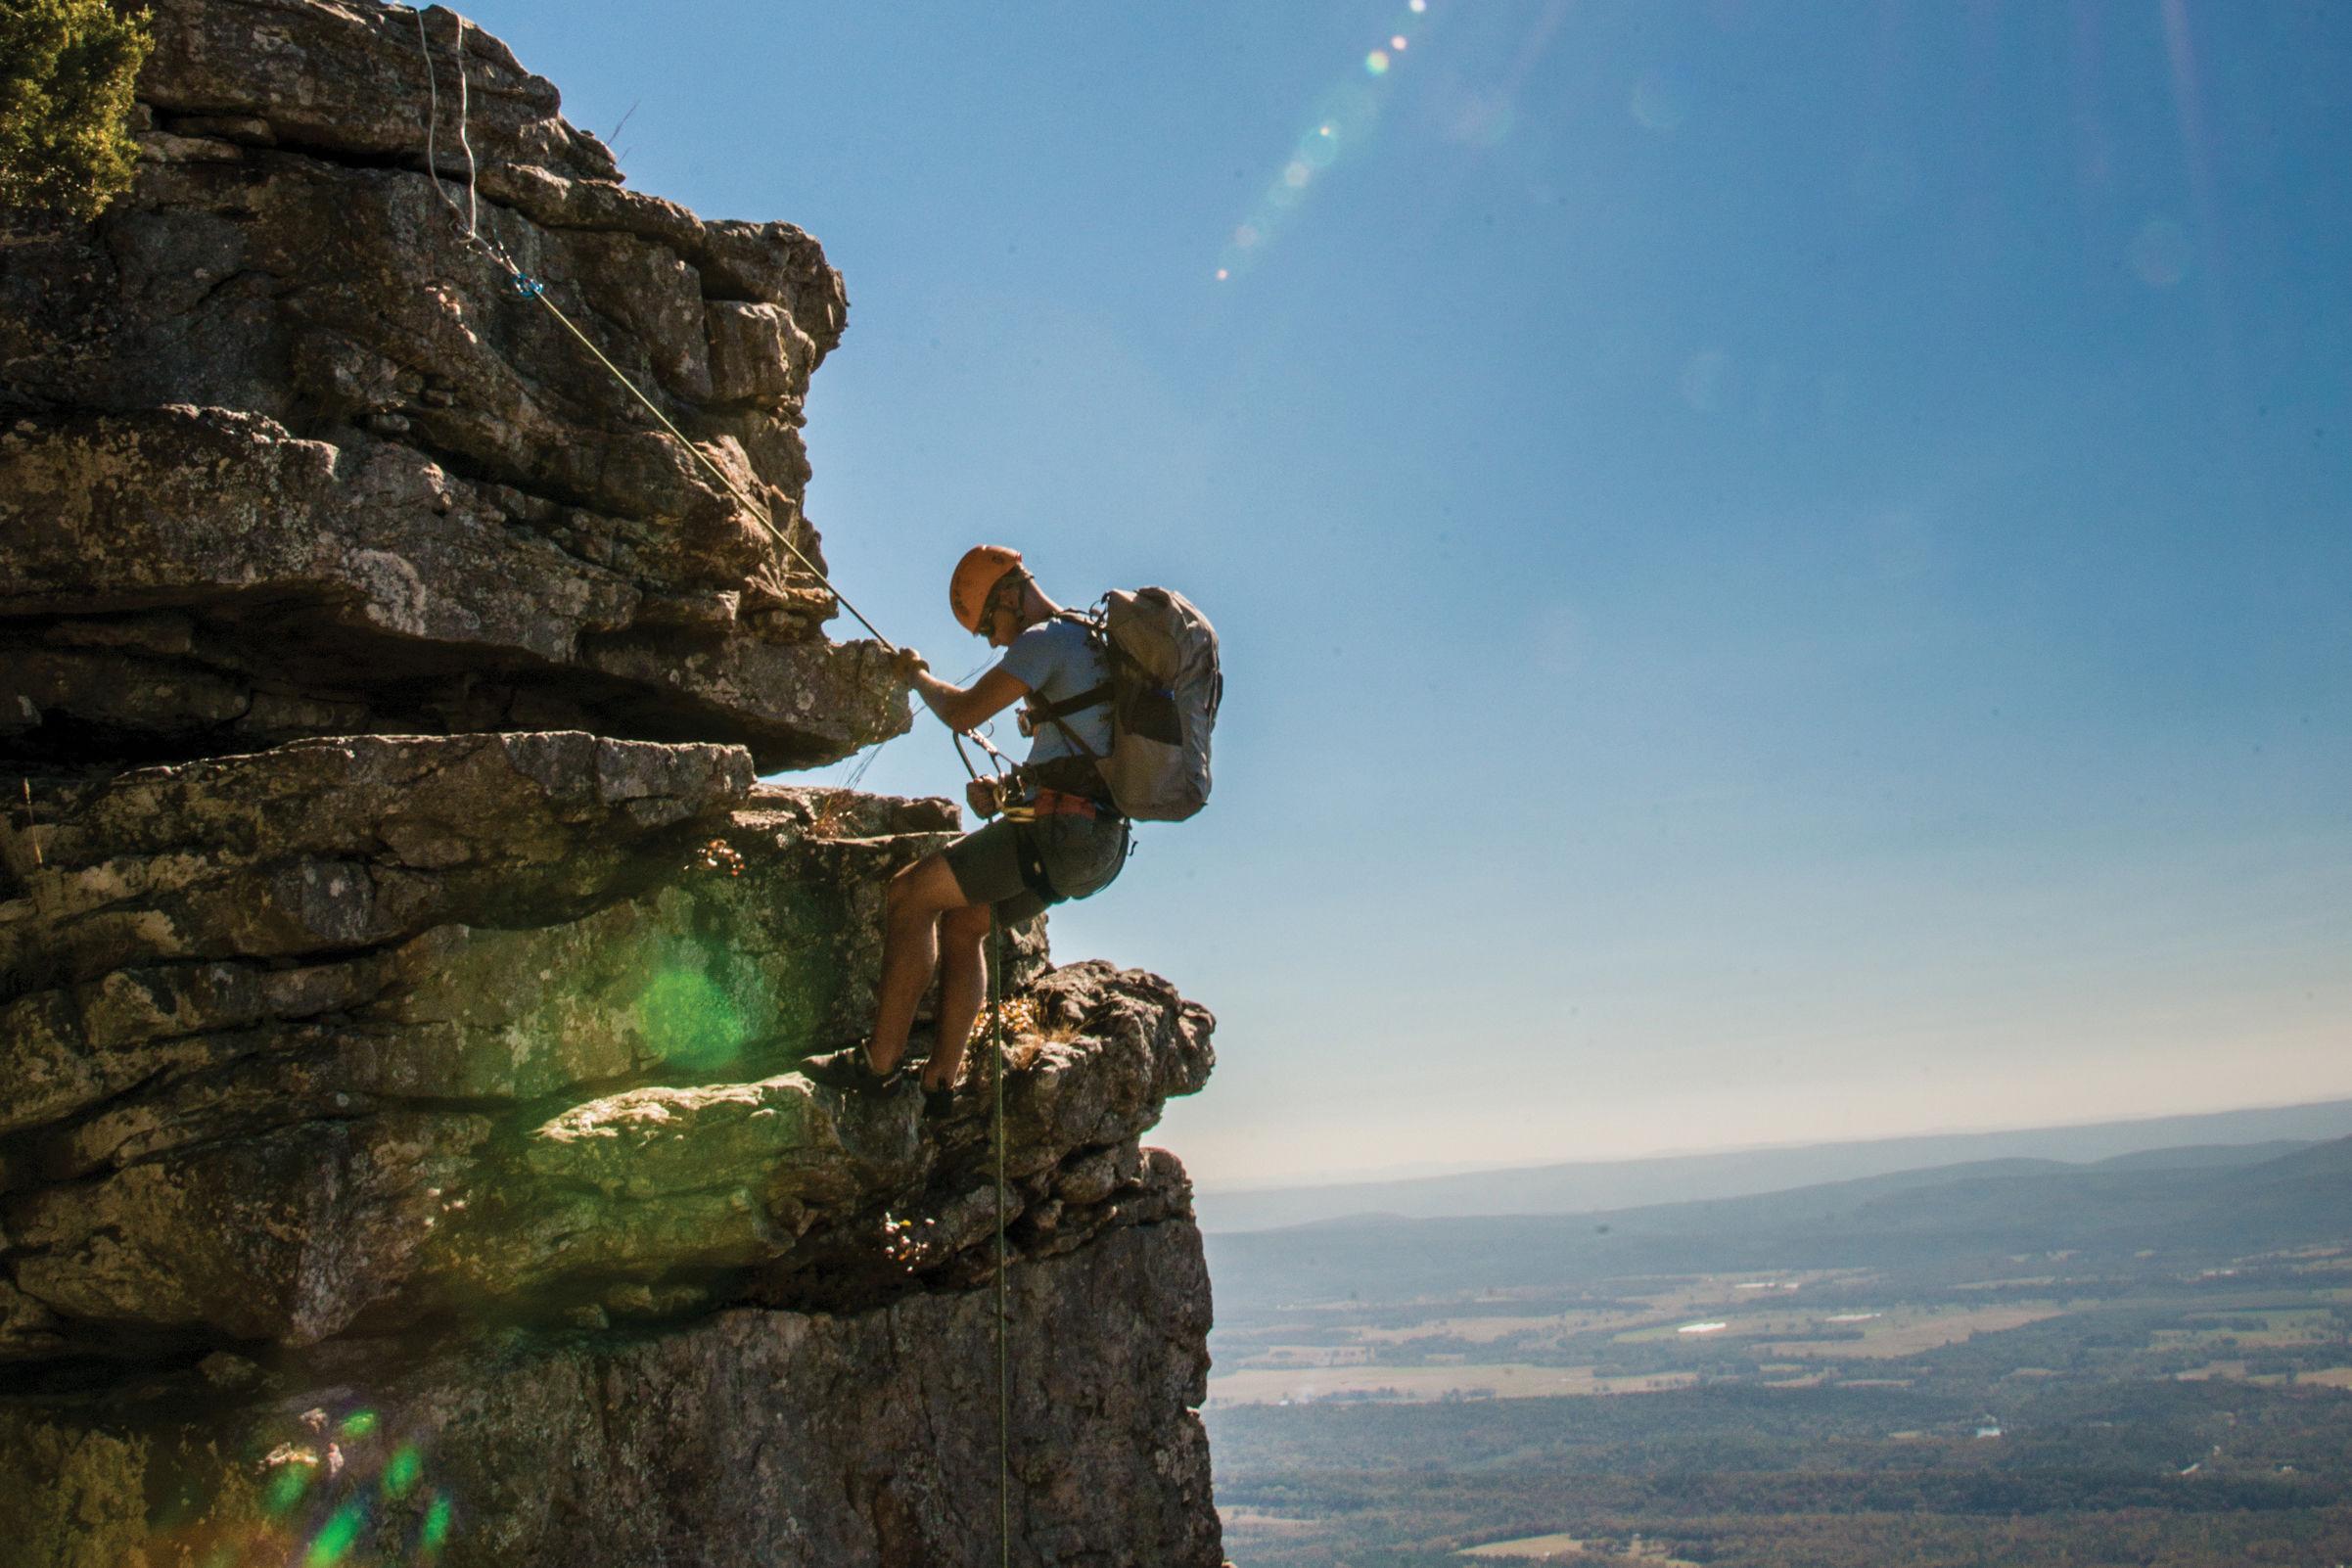 Mount magazine rockclimbing 112016 chc 5836 a2va9u